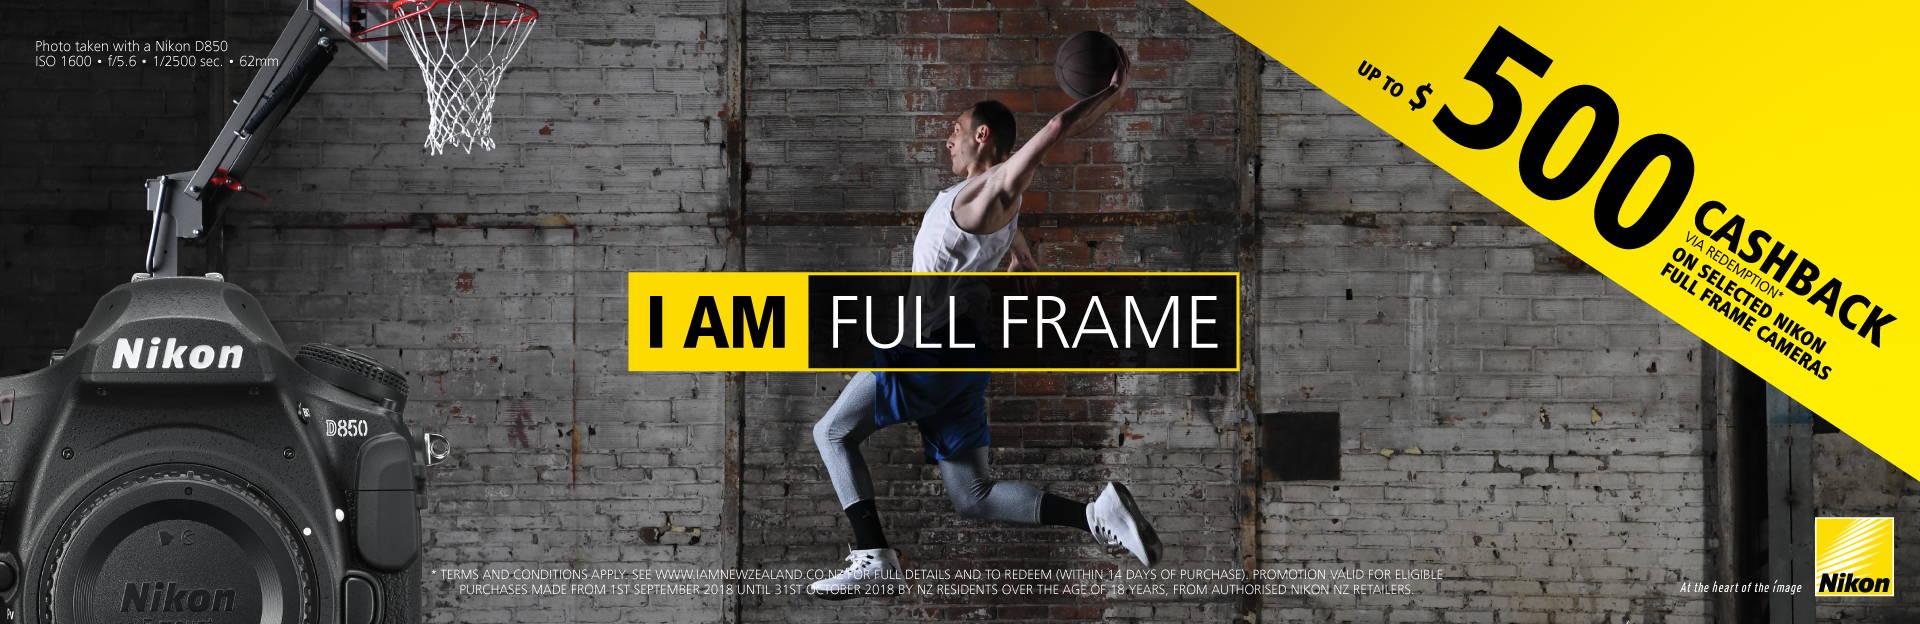 Nikon Fullframe Cashback